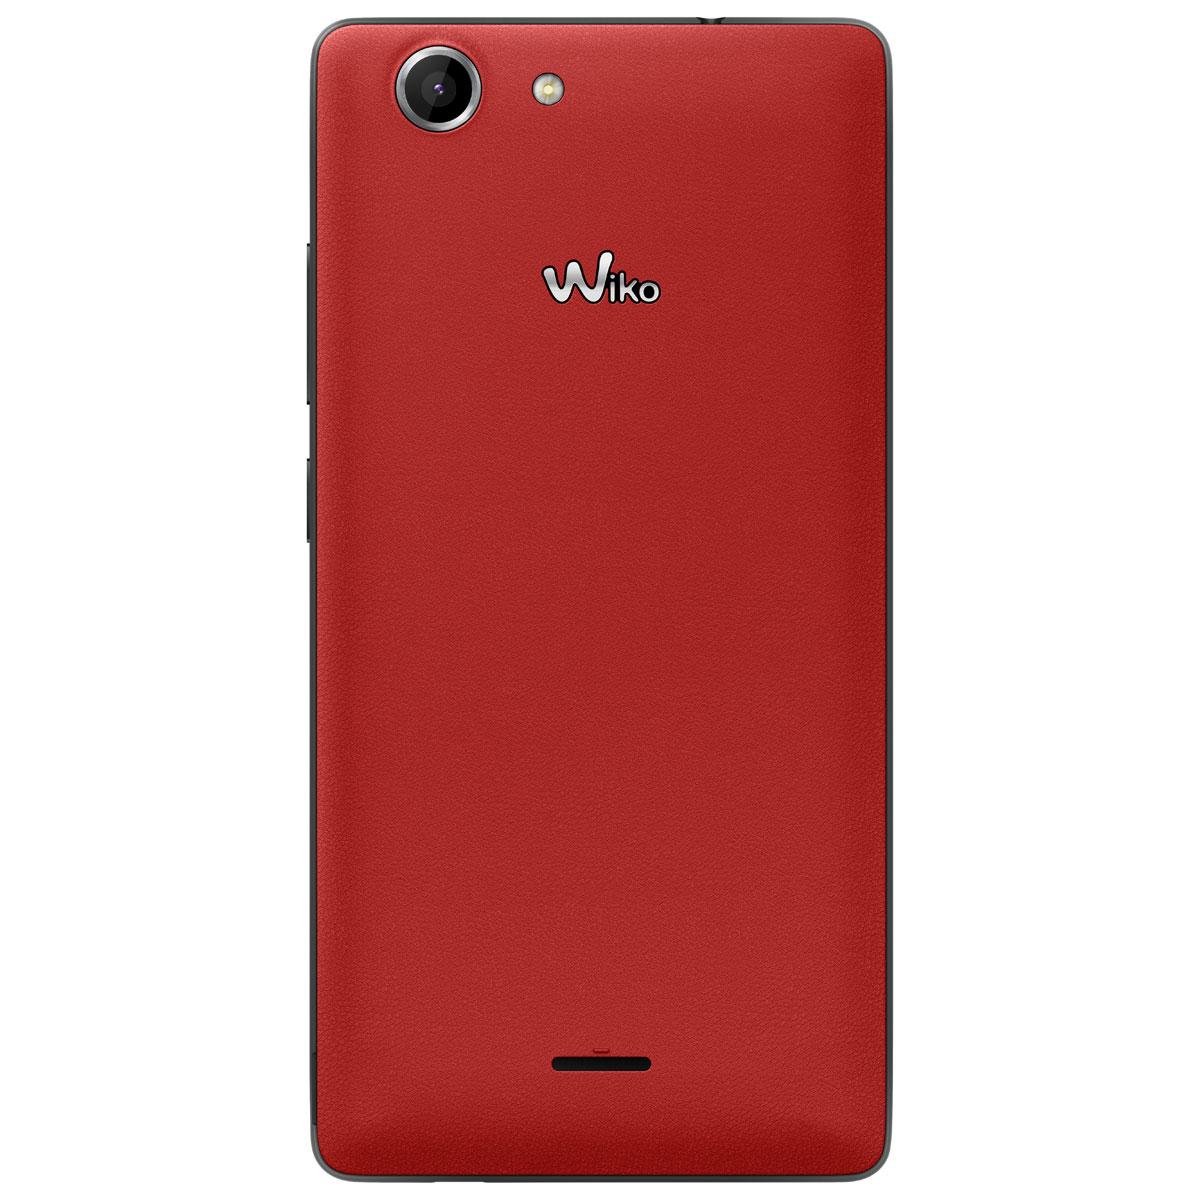 Wiko pulp 4g rouge mobile smartphone wiko sur for Photo ecran wiko